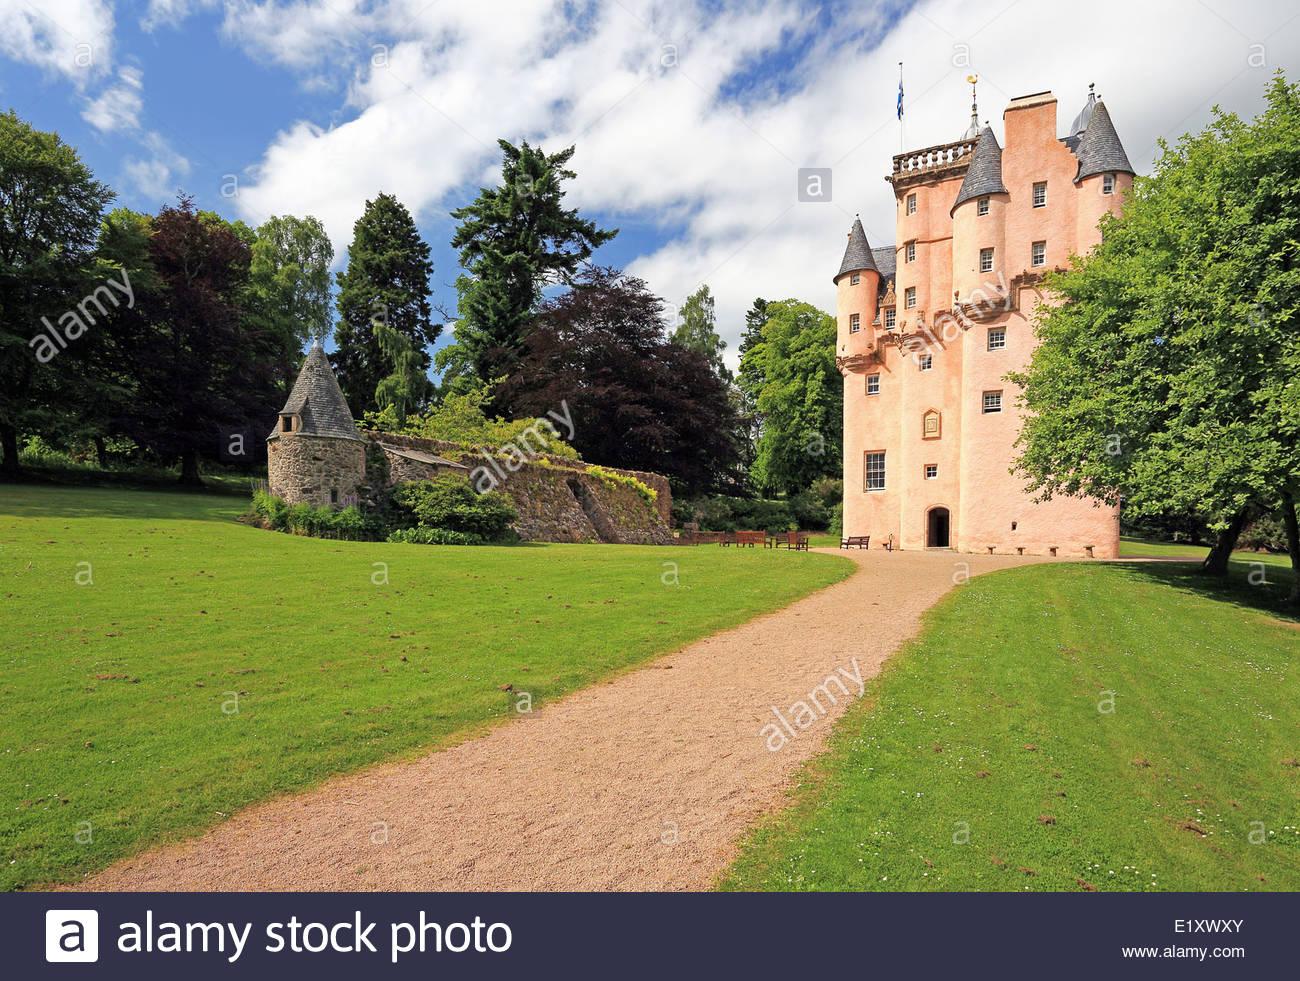 Cragievar Castle in Aberdeenshire - Stock Image